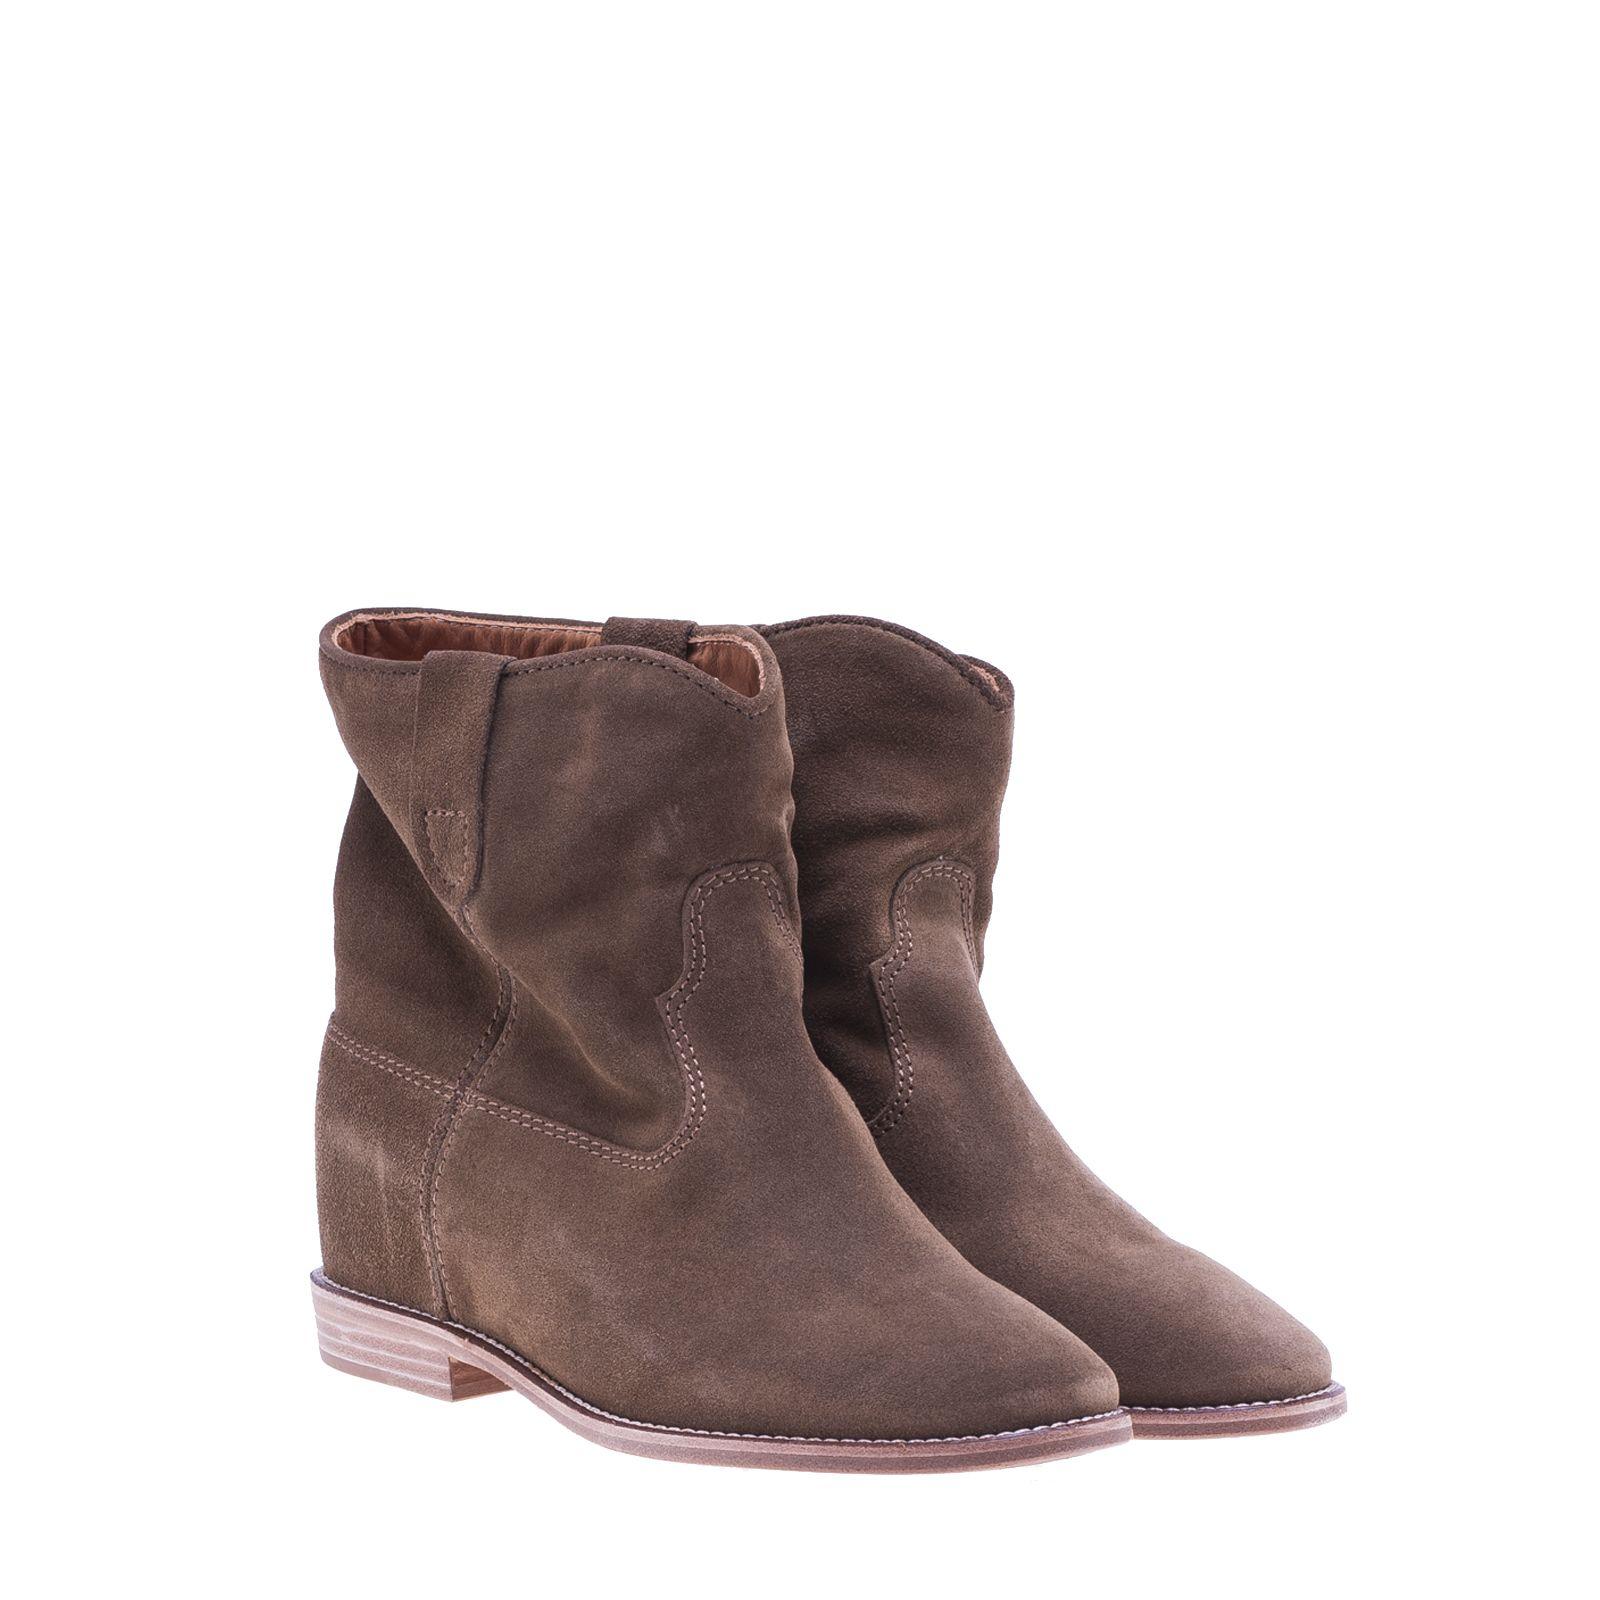 isabel marant isabel marant crisi boots brown women 39 s boots italist. Black Bedroom Furniture Sets. Home Design Ideas